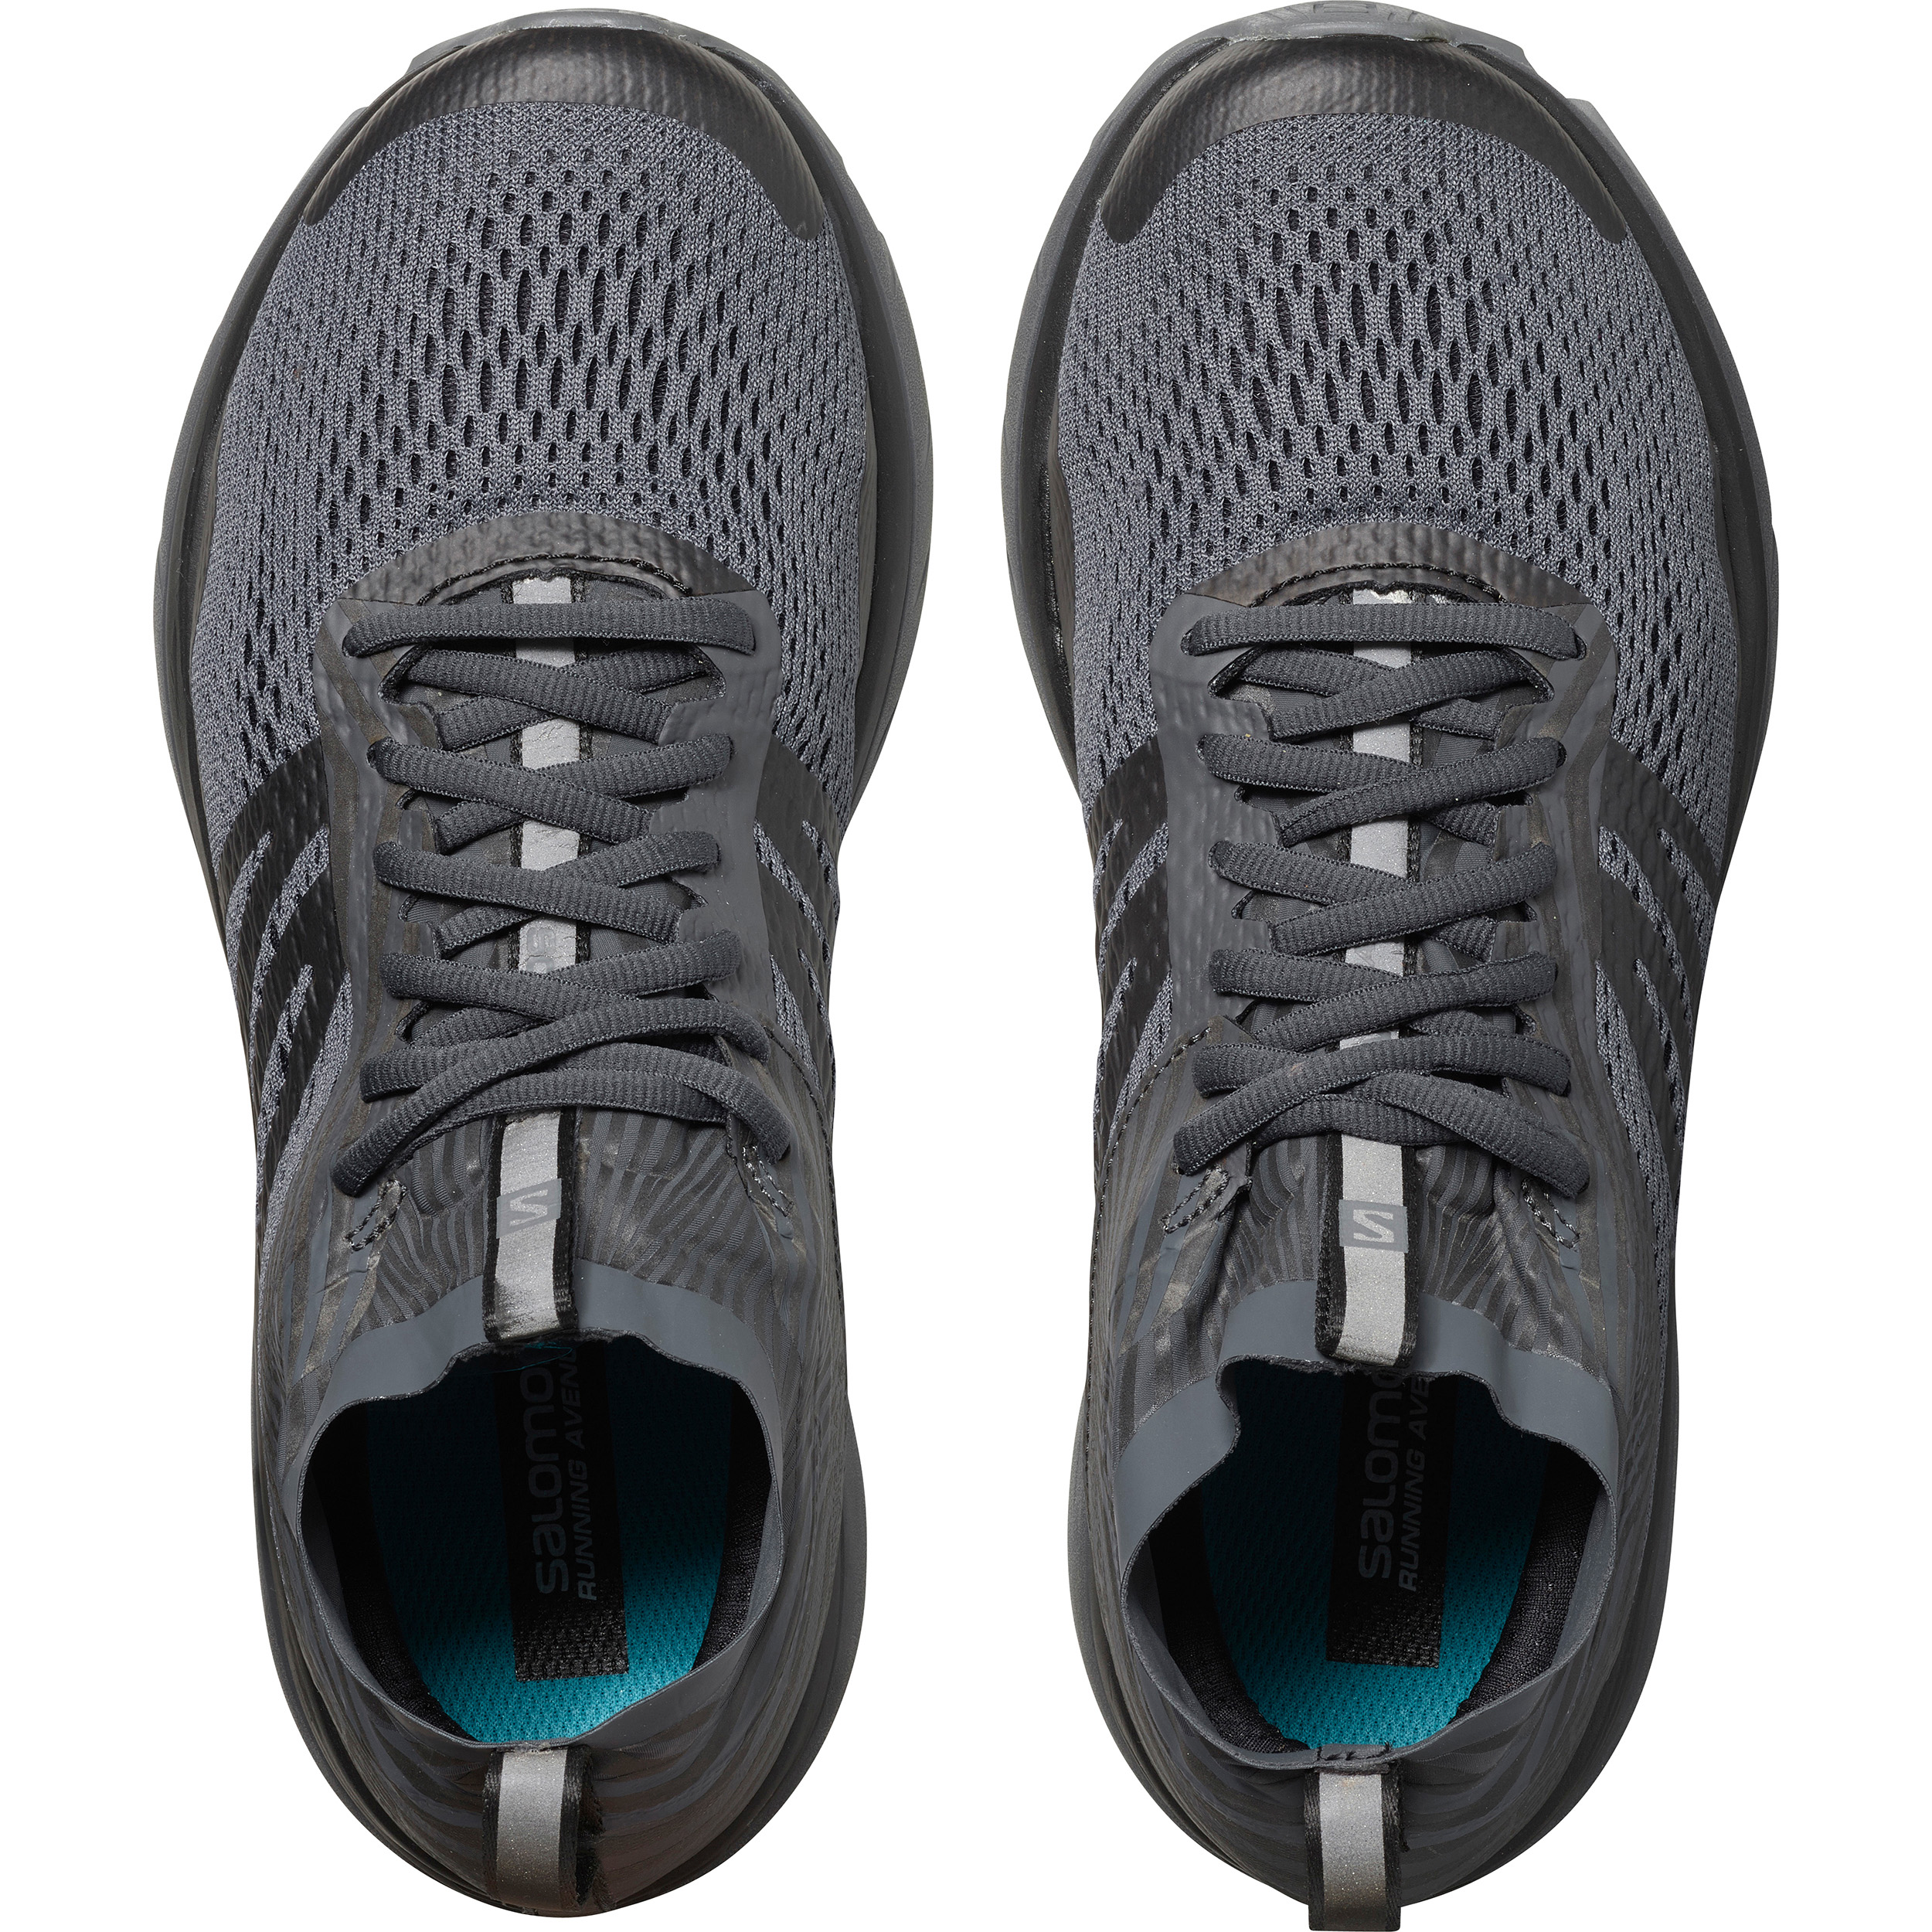 Salomon Sonic RA 2 Nocturne Road Running Shoes Women's